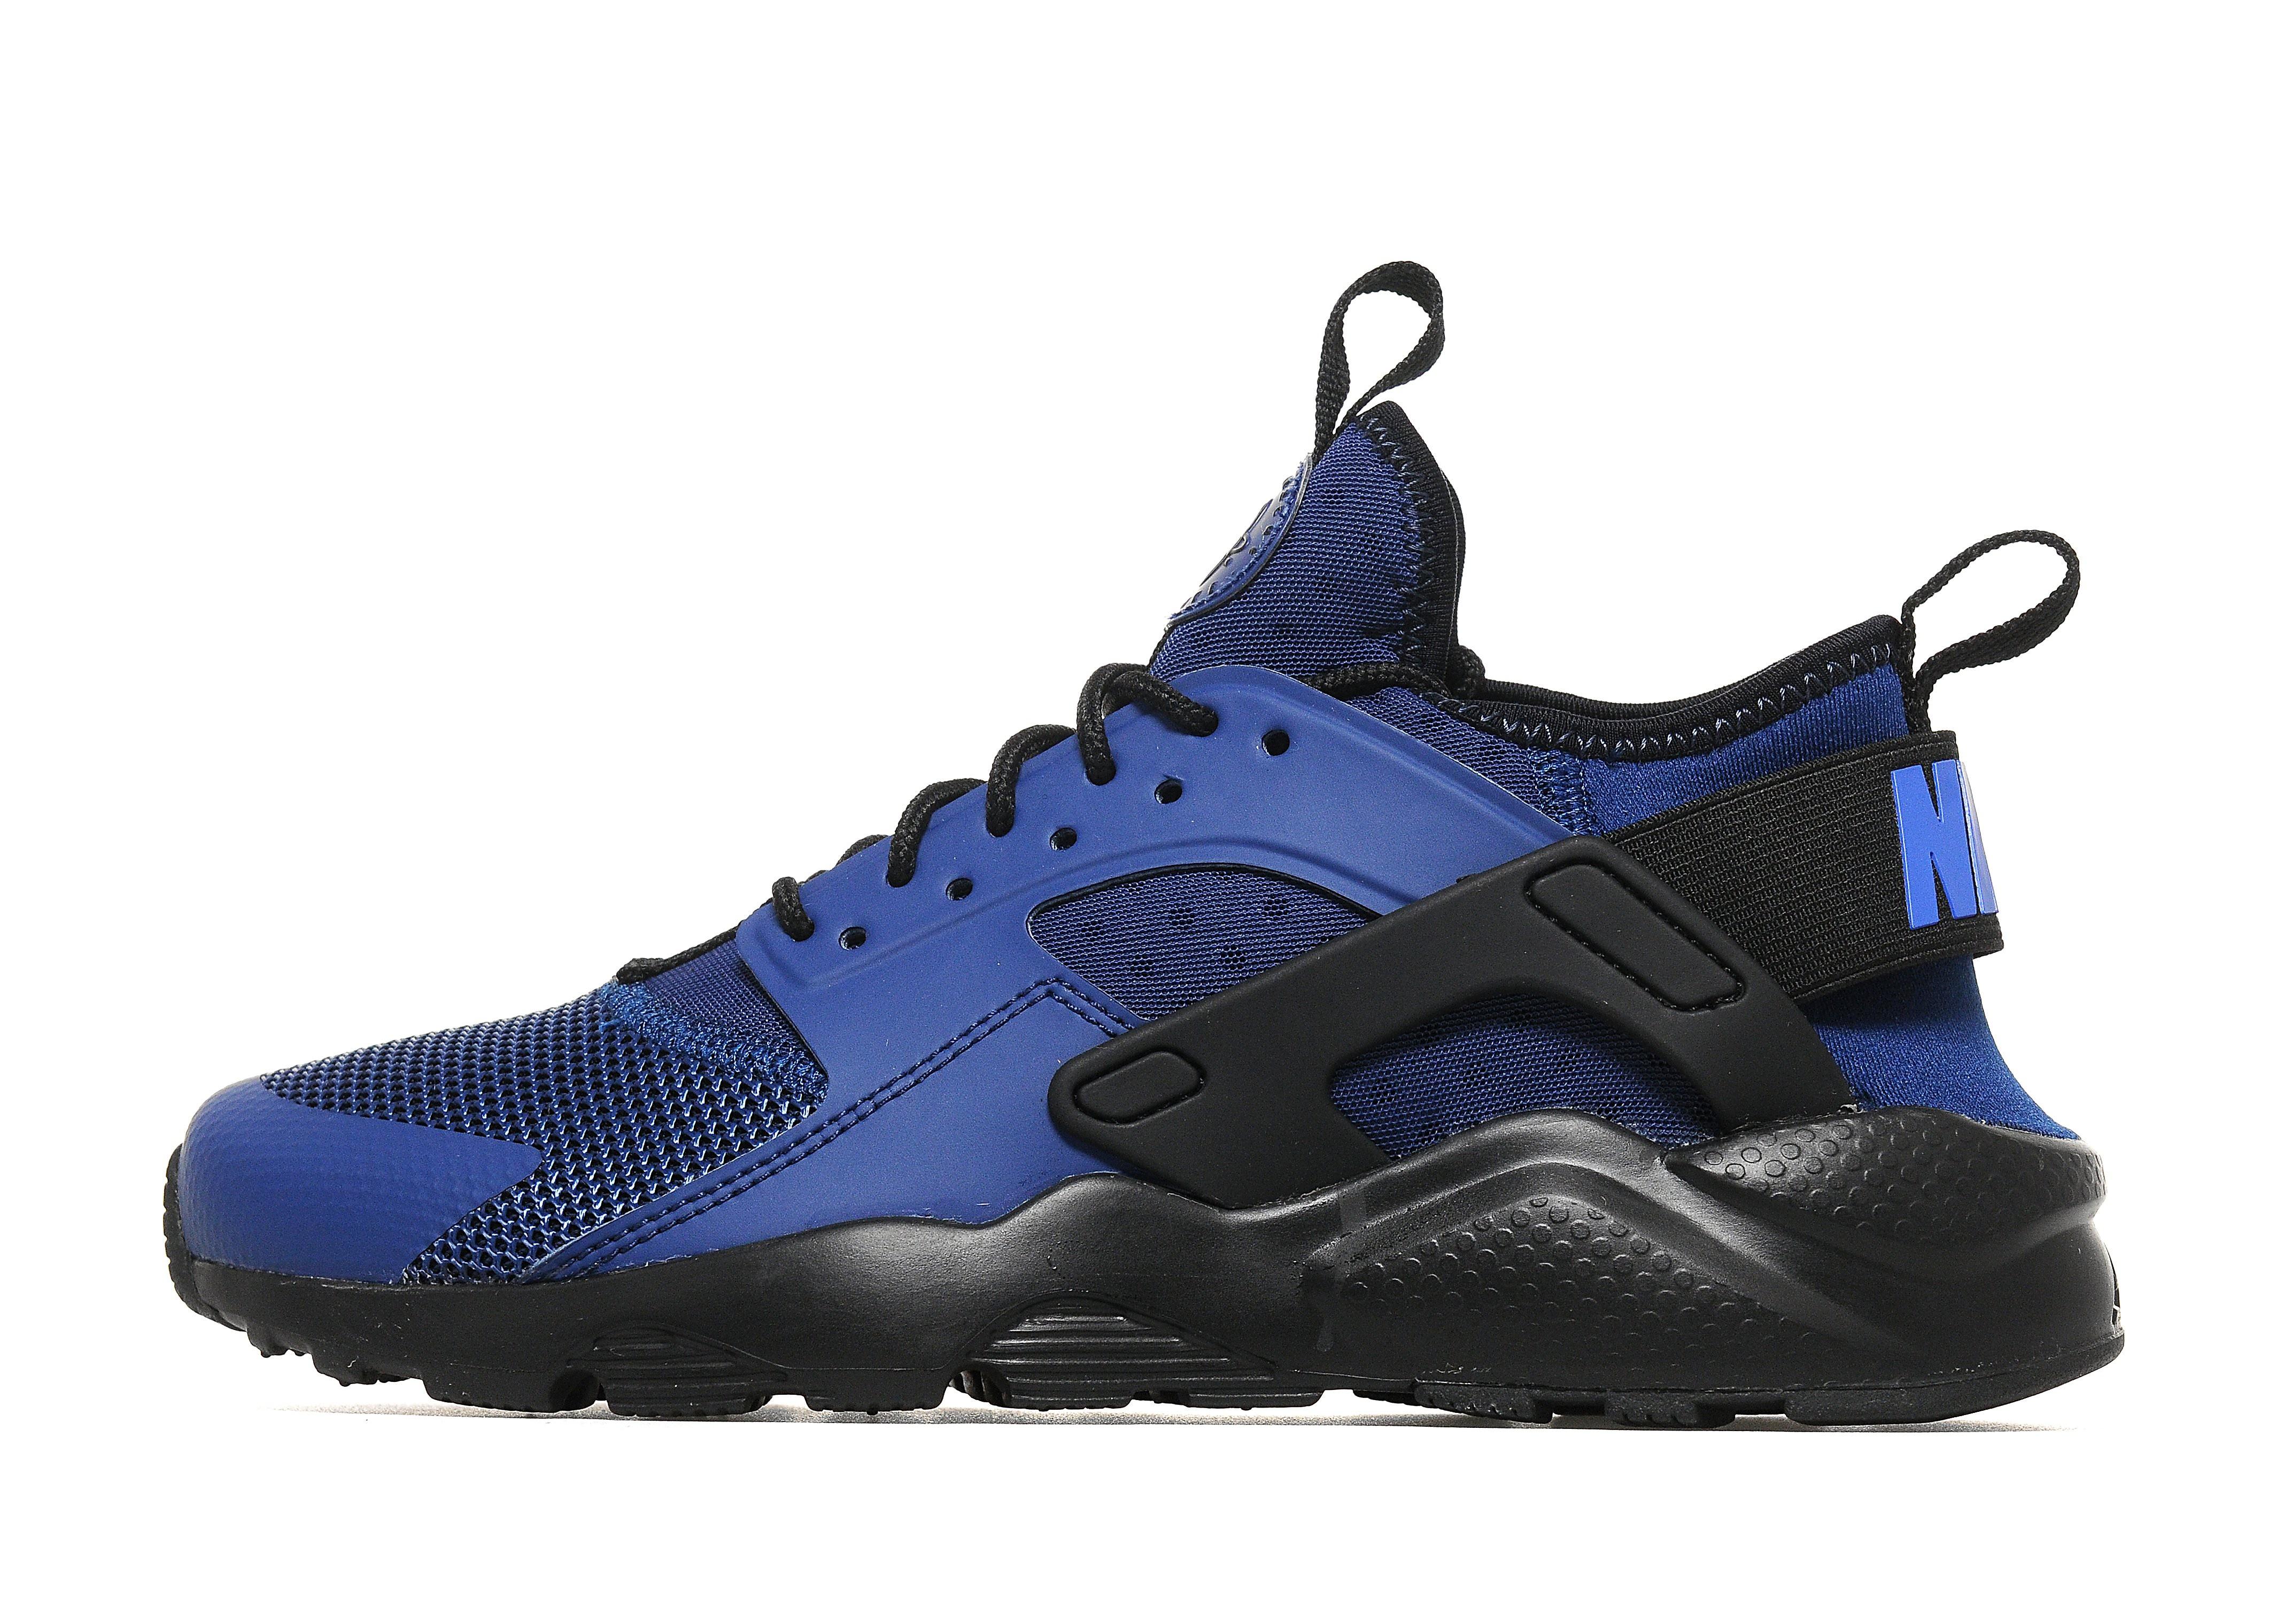 brand new a856c 96819 ... discount nike huarache ultra breathe junior blue black kids sports king  store 5fc39 009c3